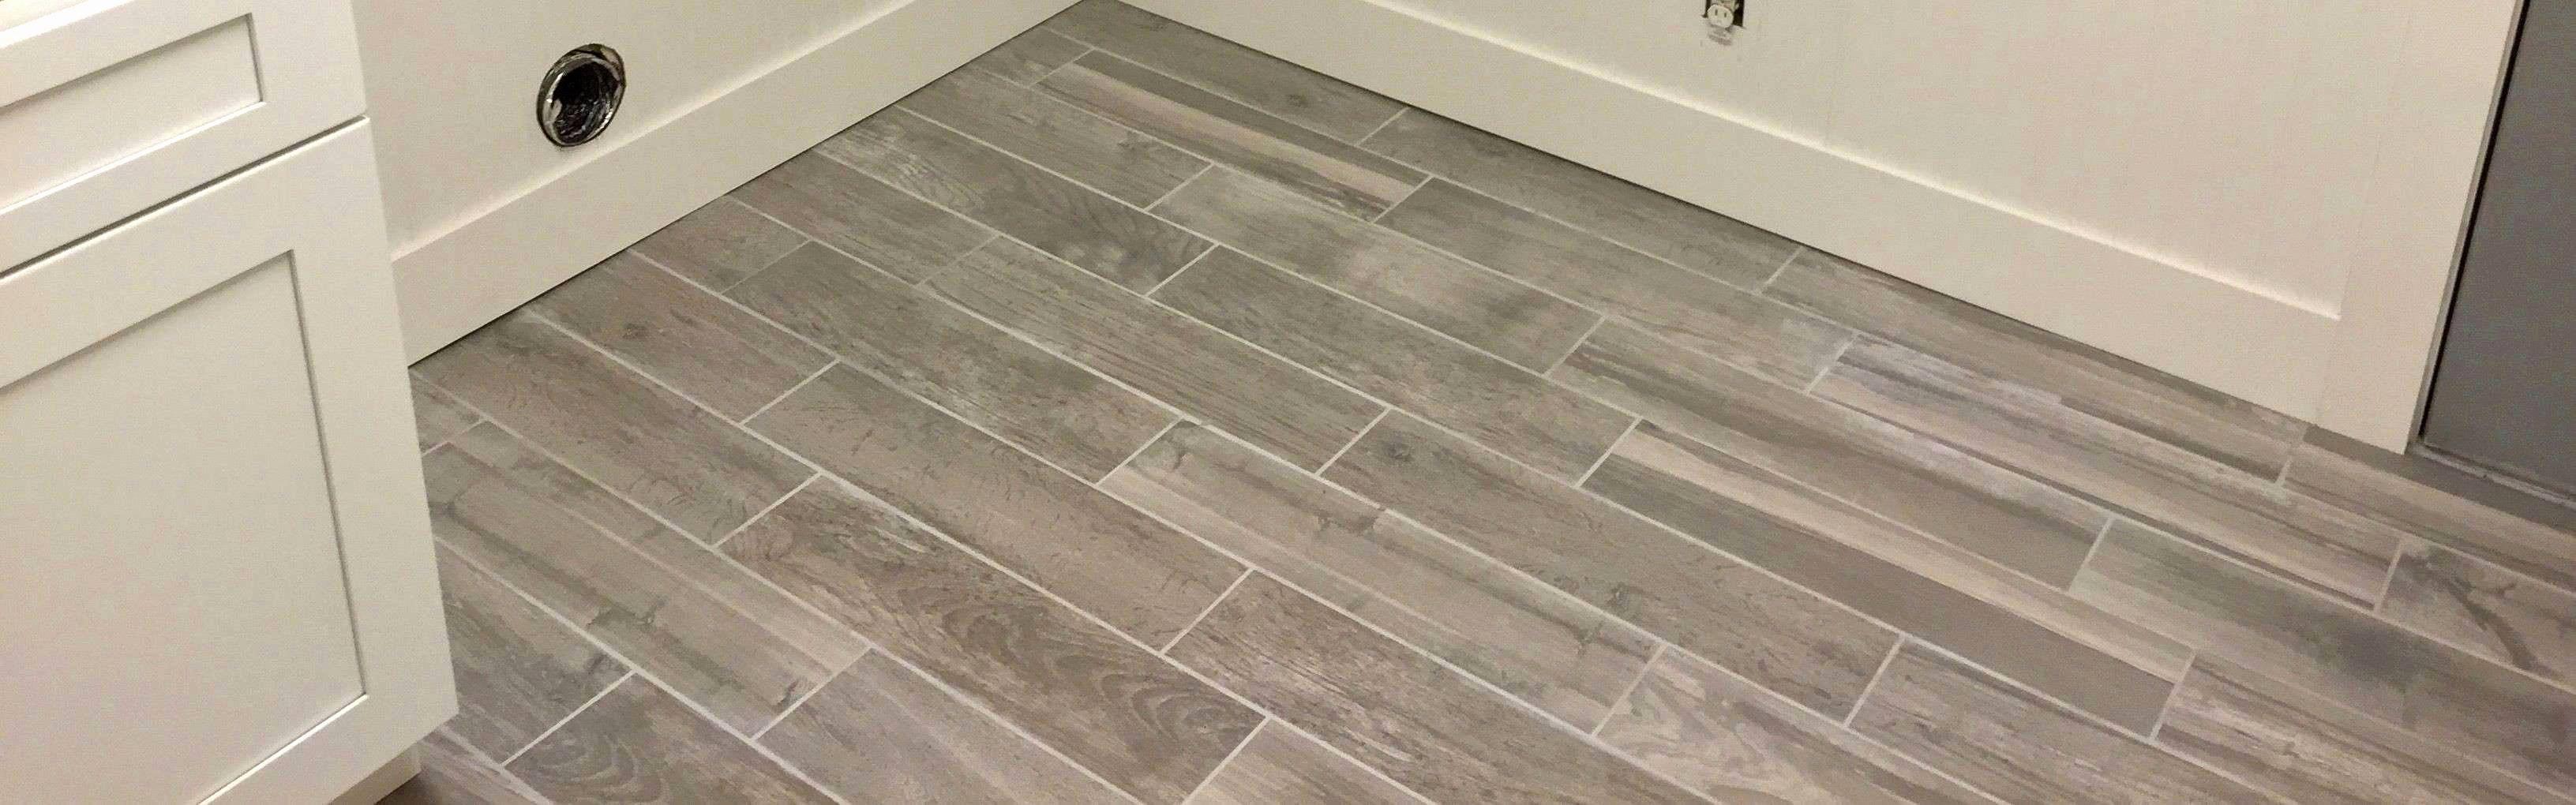 hardwood floor in bathroom of hardwood floor care floor plan ideas intended for unique bathroom tiling ideas best h sink install bathroom i 0d exciting beautiful fresh bathroom floor